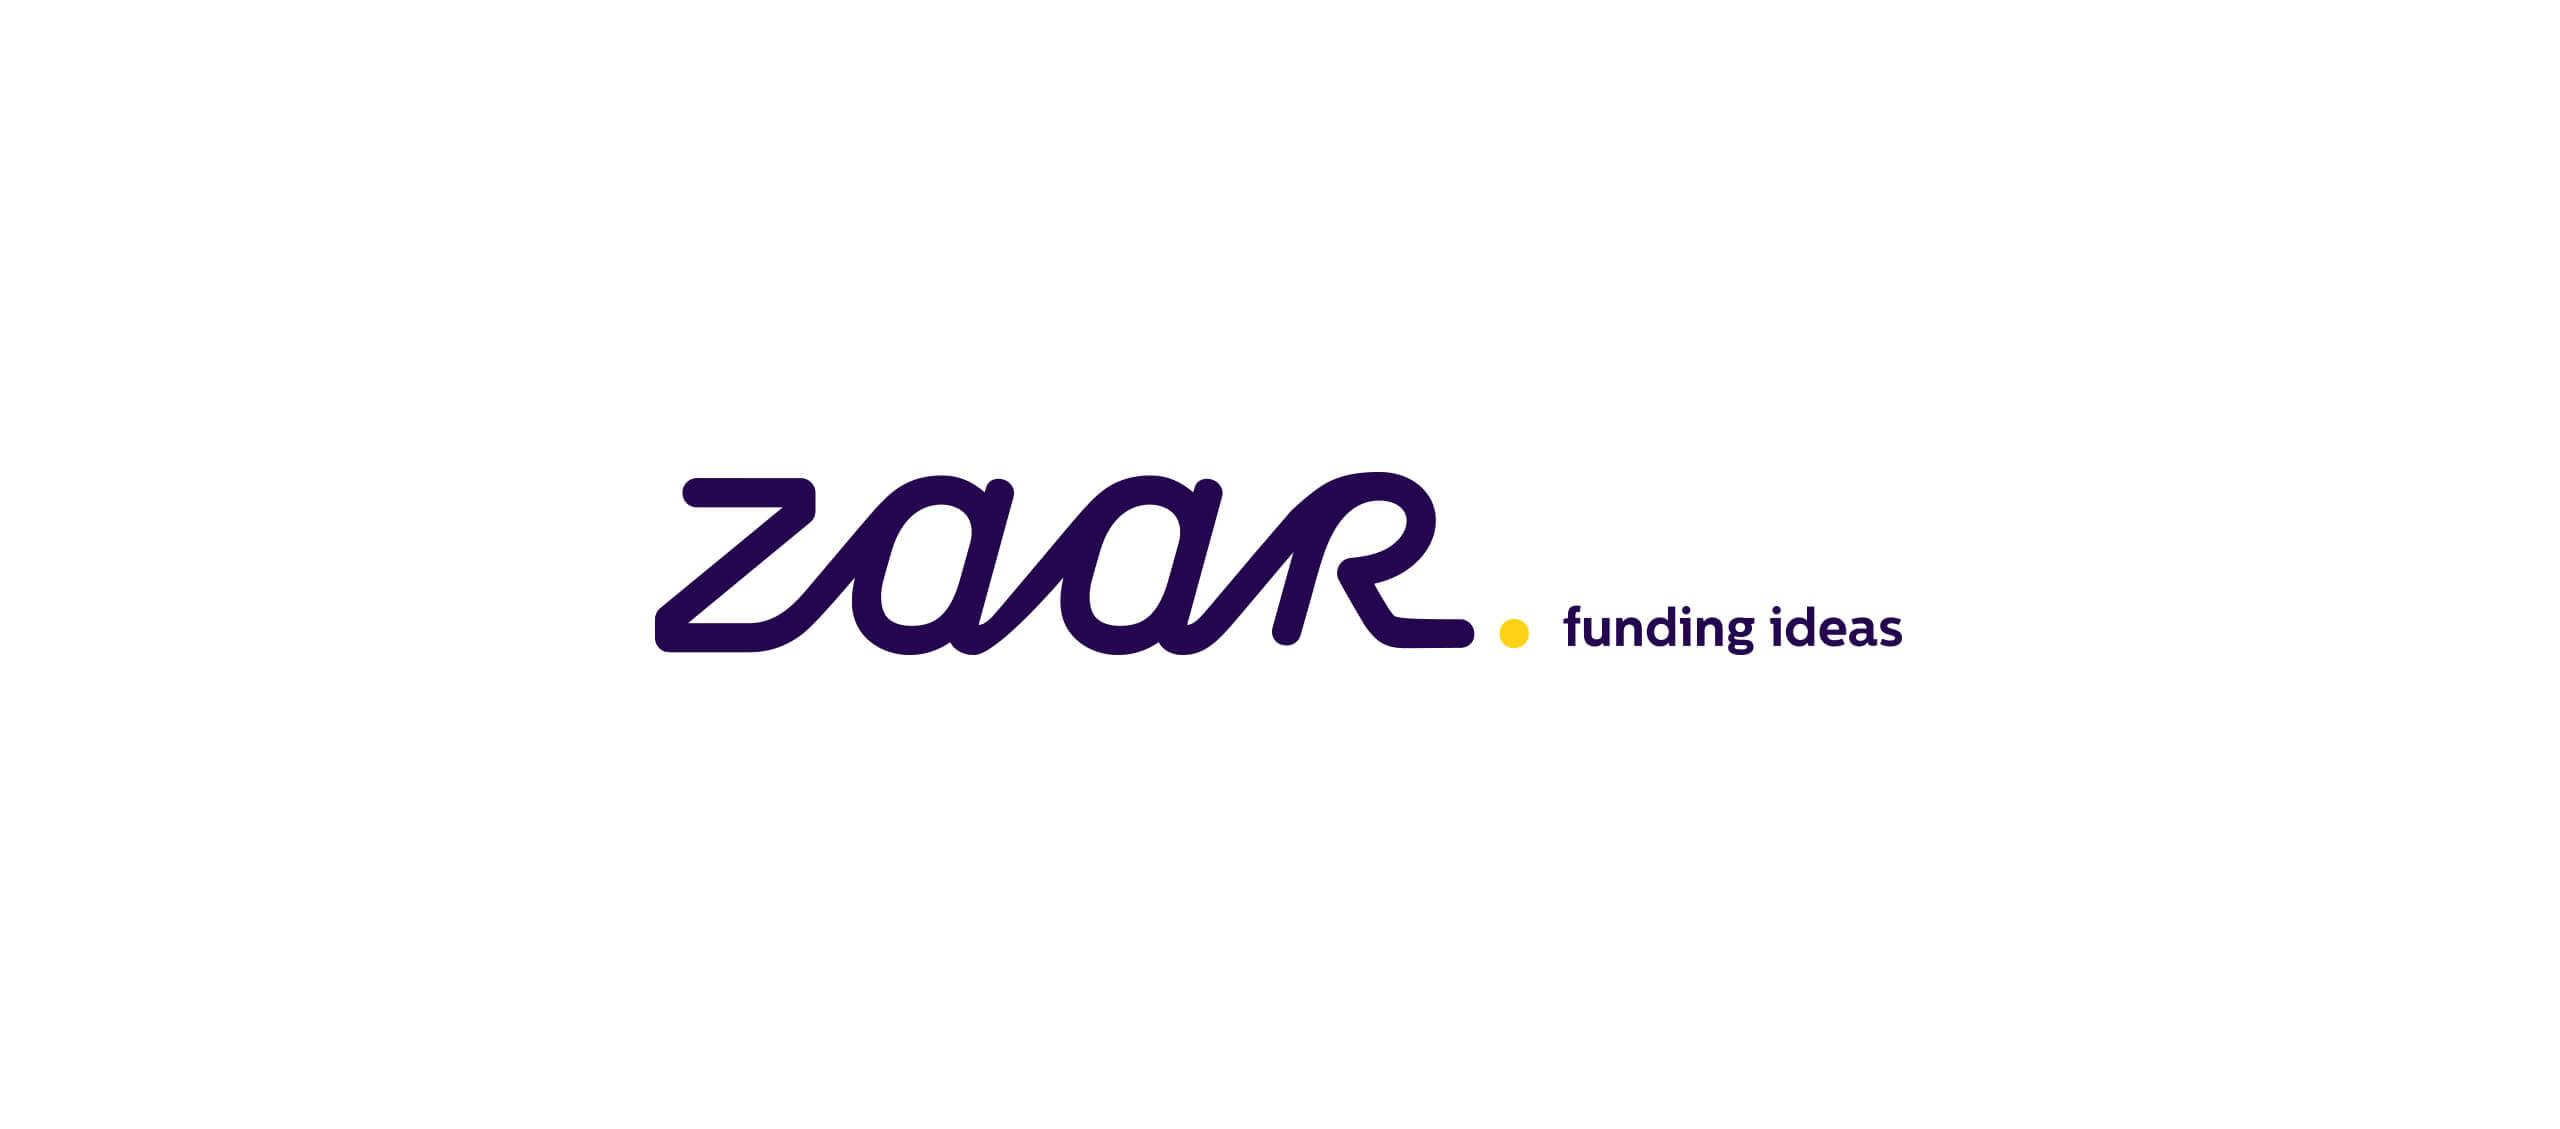 The-Concept-Stadium-Zaar-Behance-01_01 case study